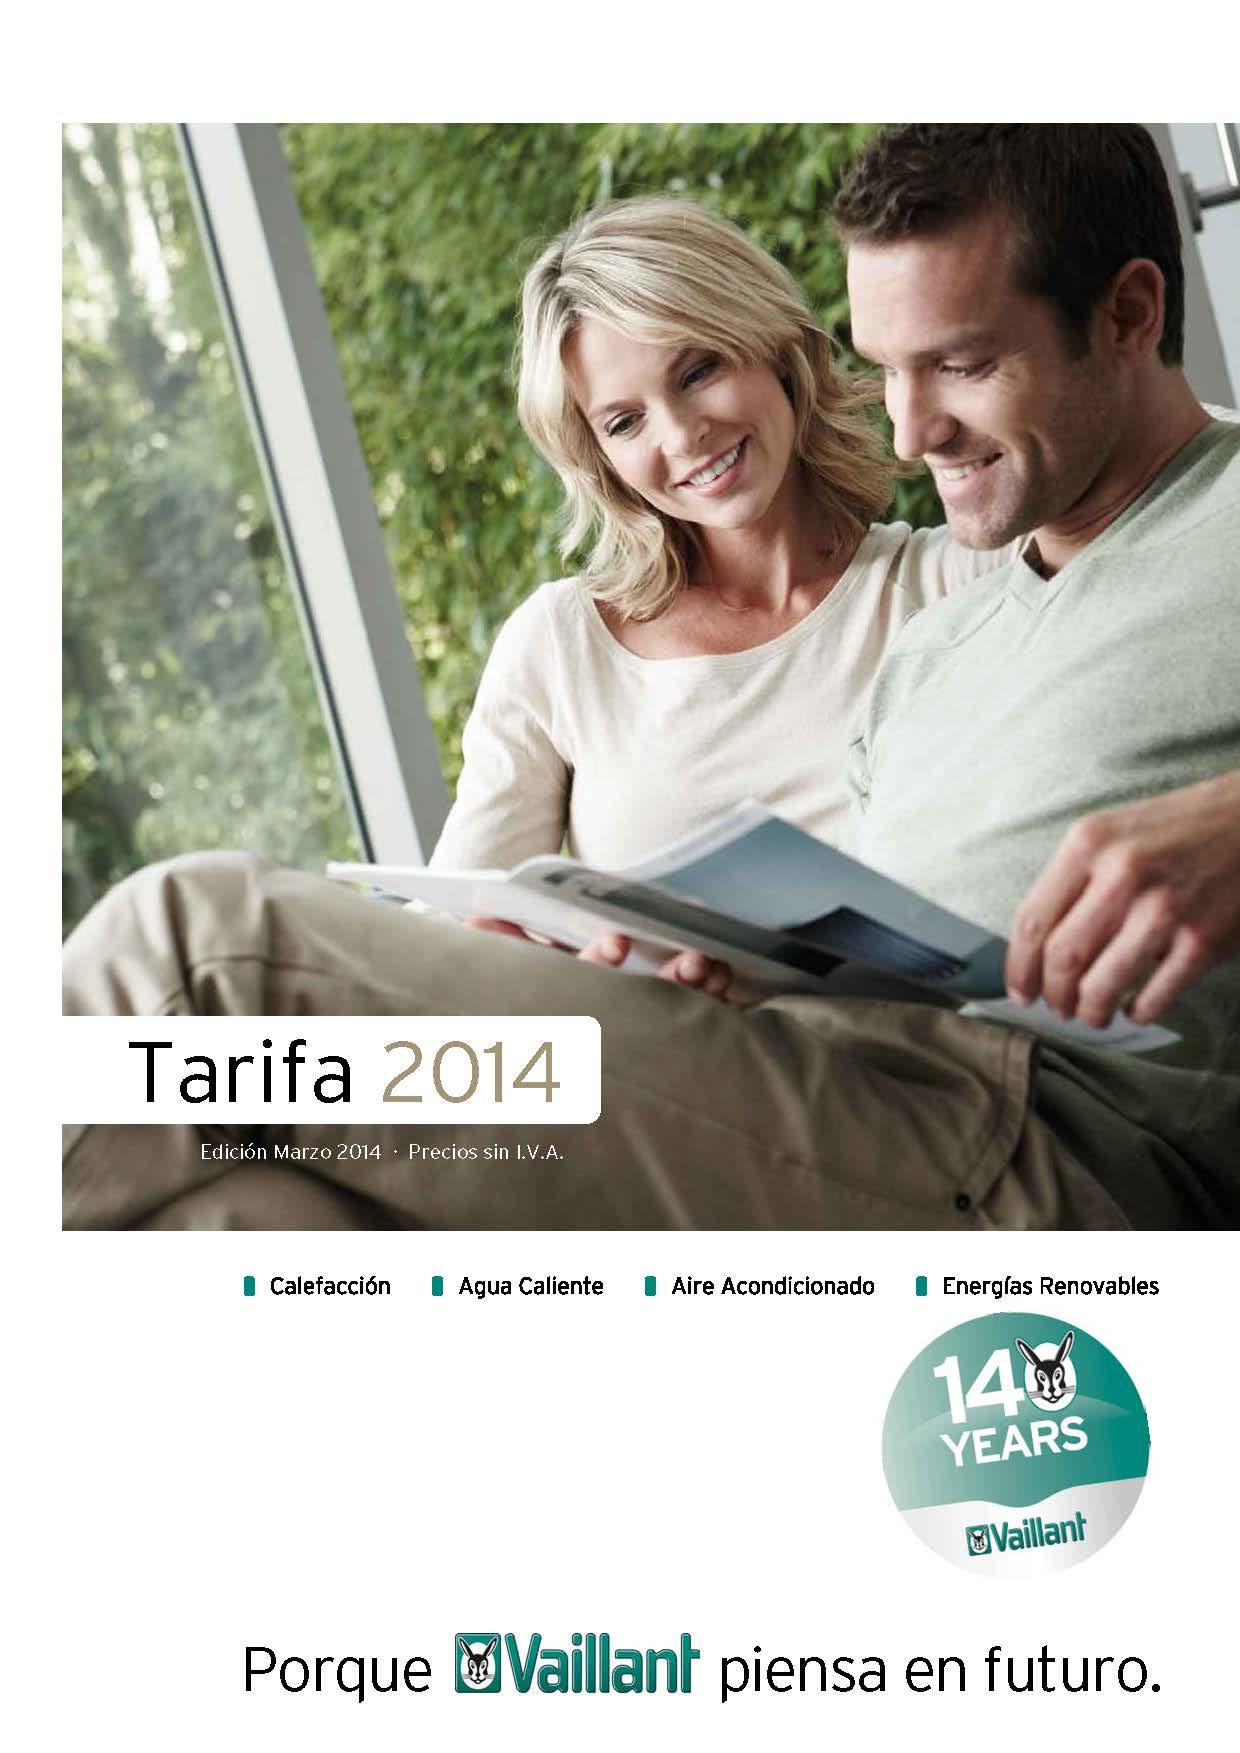 Tarifa VAILLANT 2014